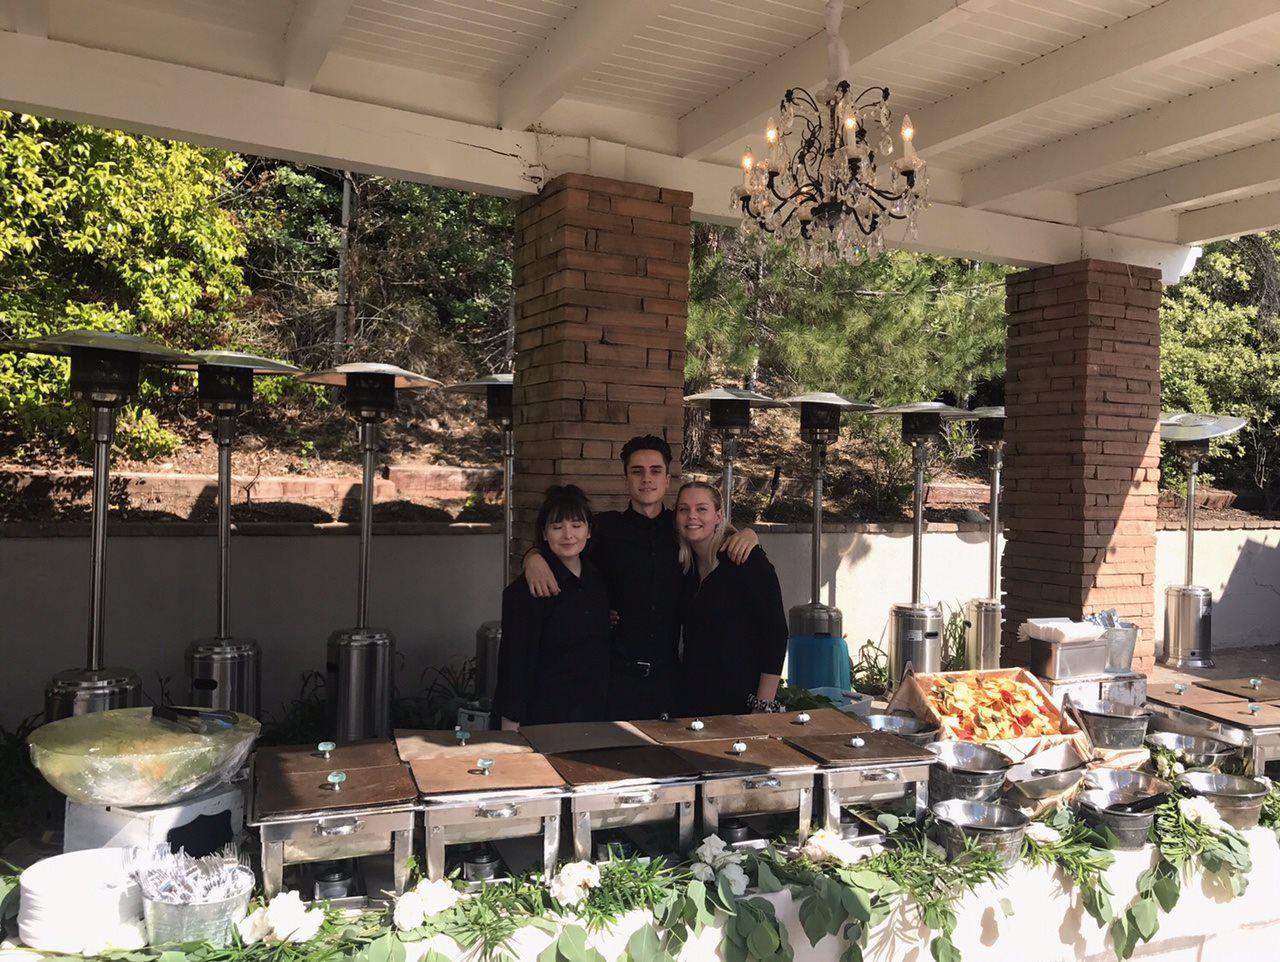 catering photos caliente southwest grille